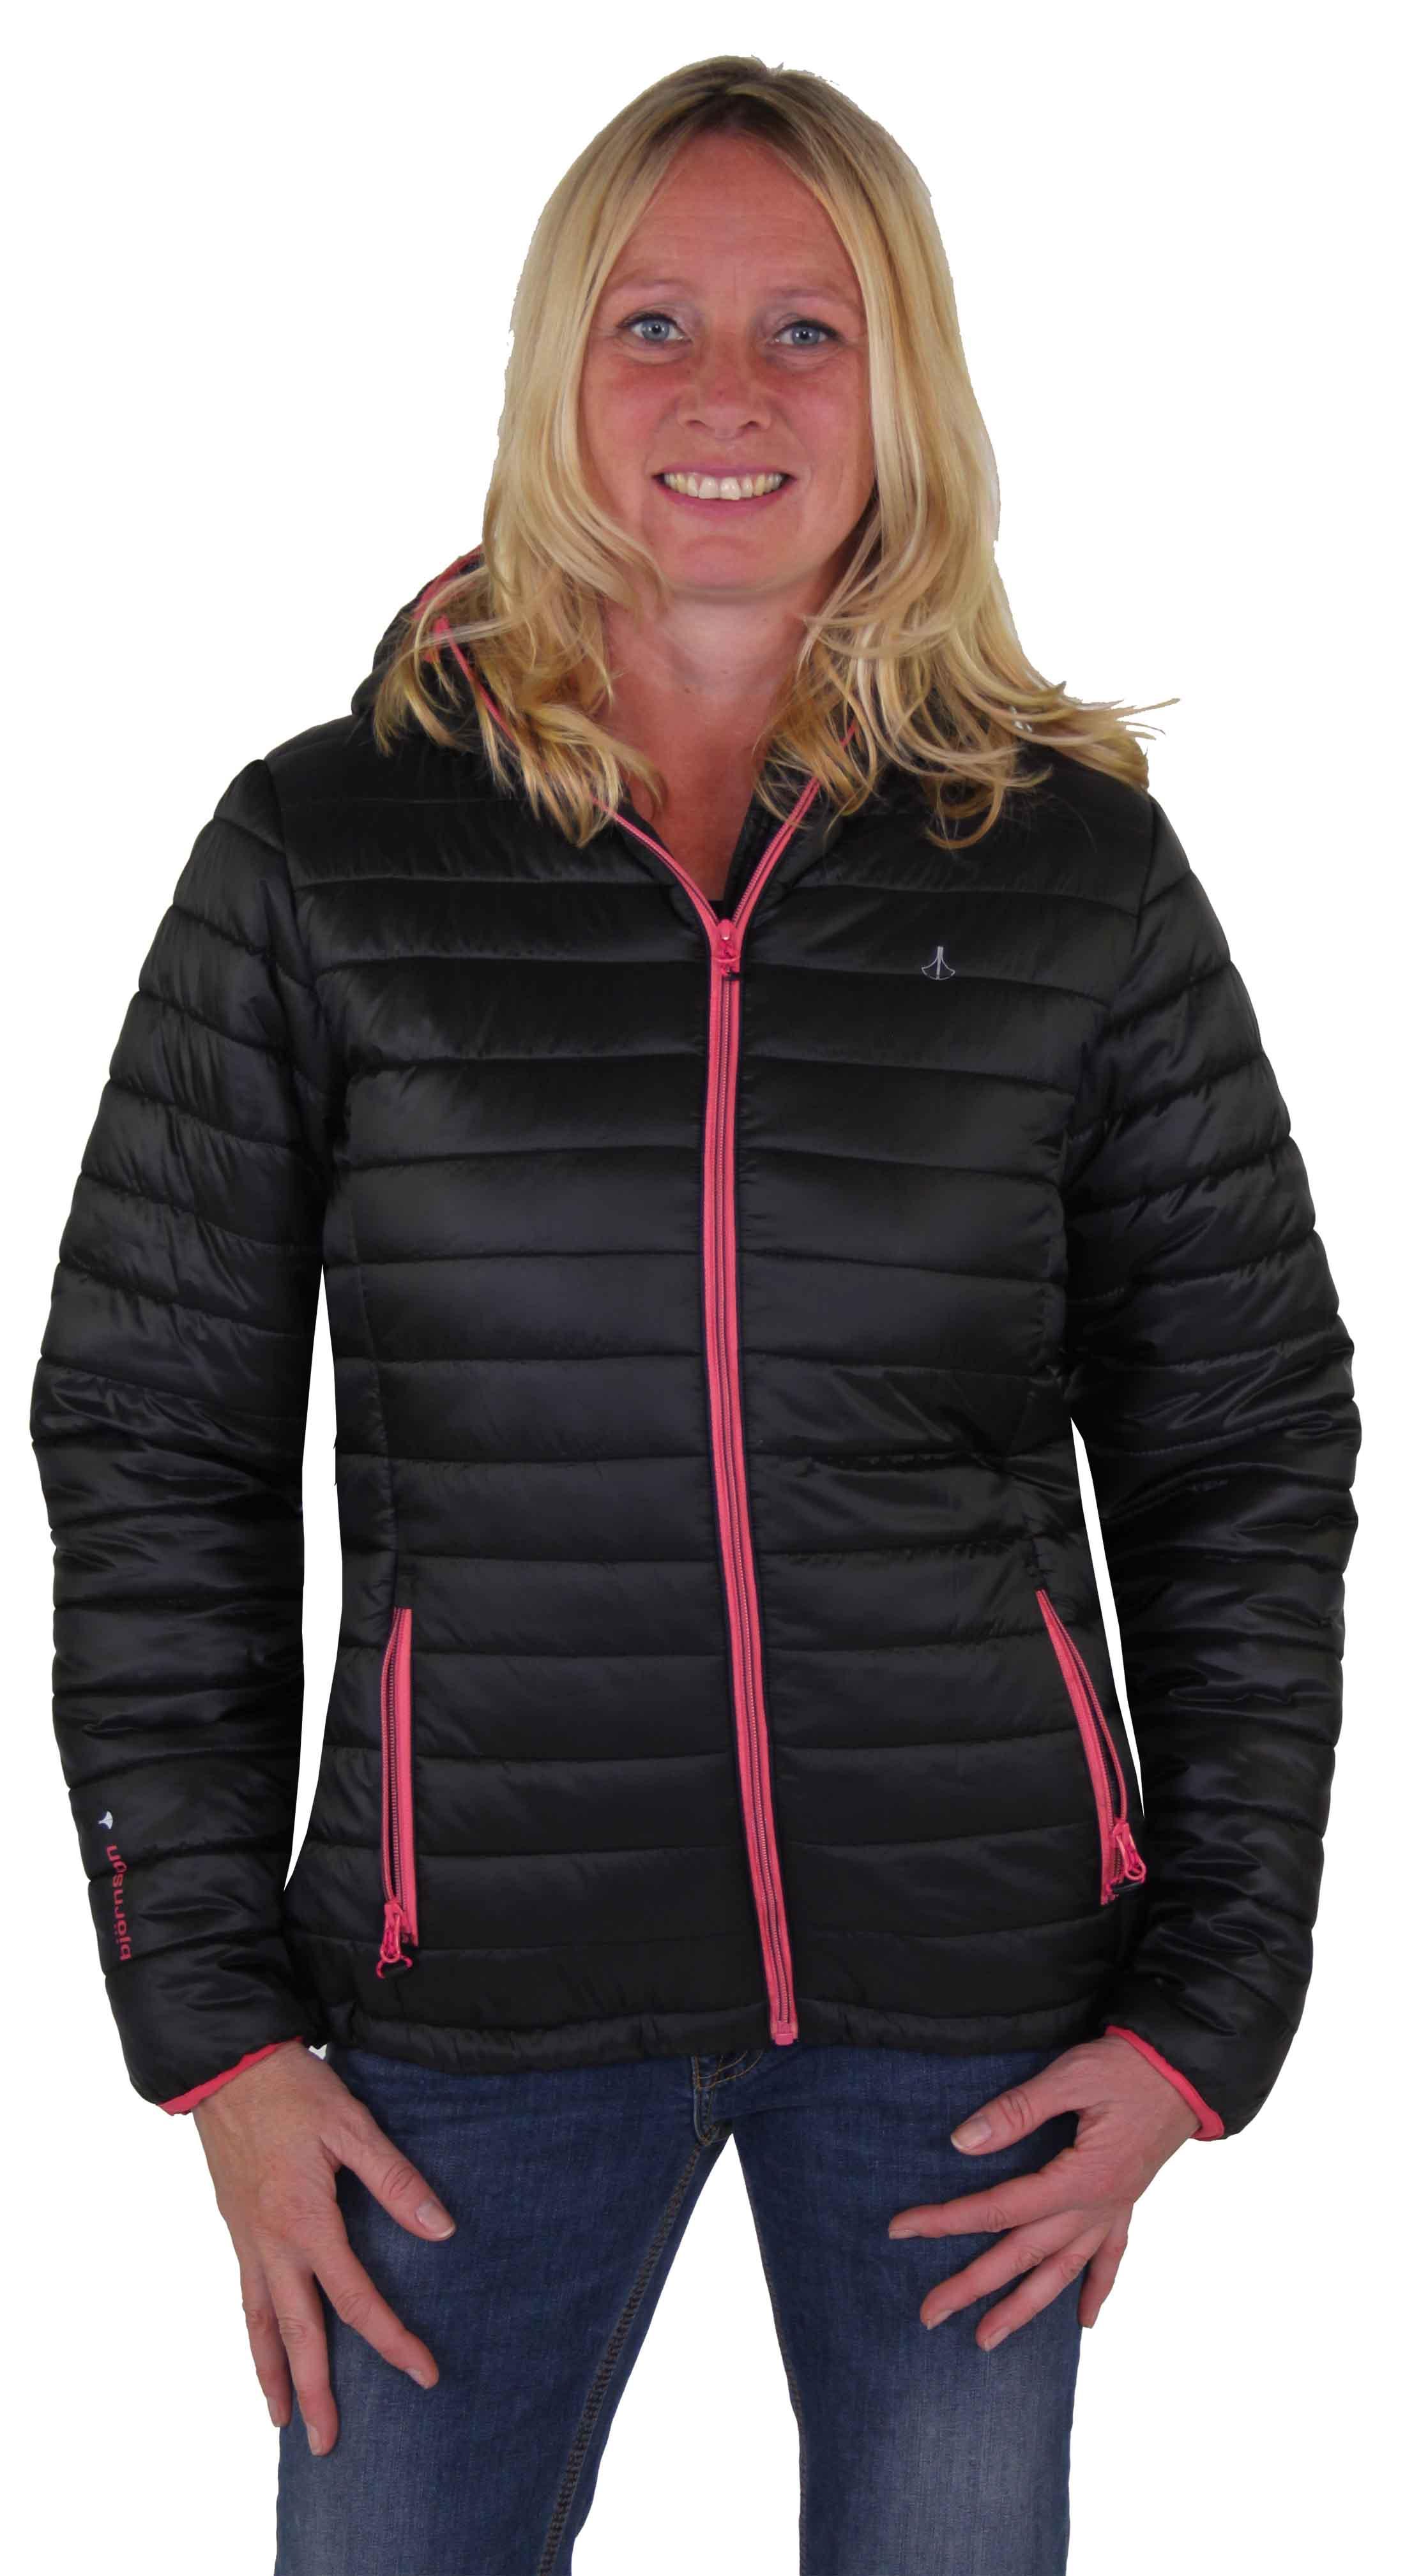 Zwarte dames winterjas kopen - Bjornson.nl - Outdoorkleding